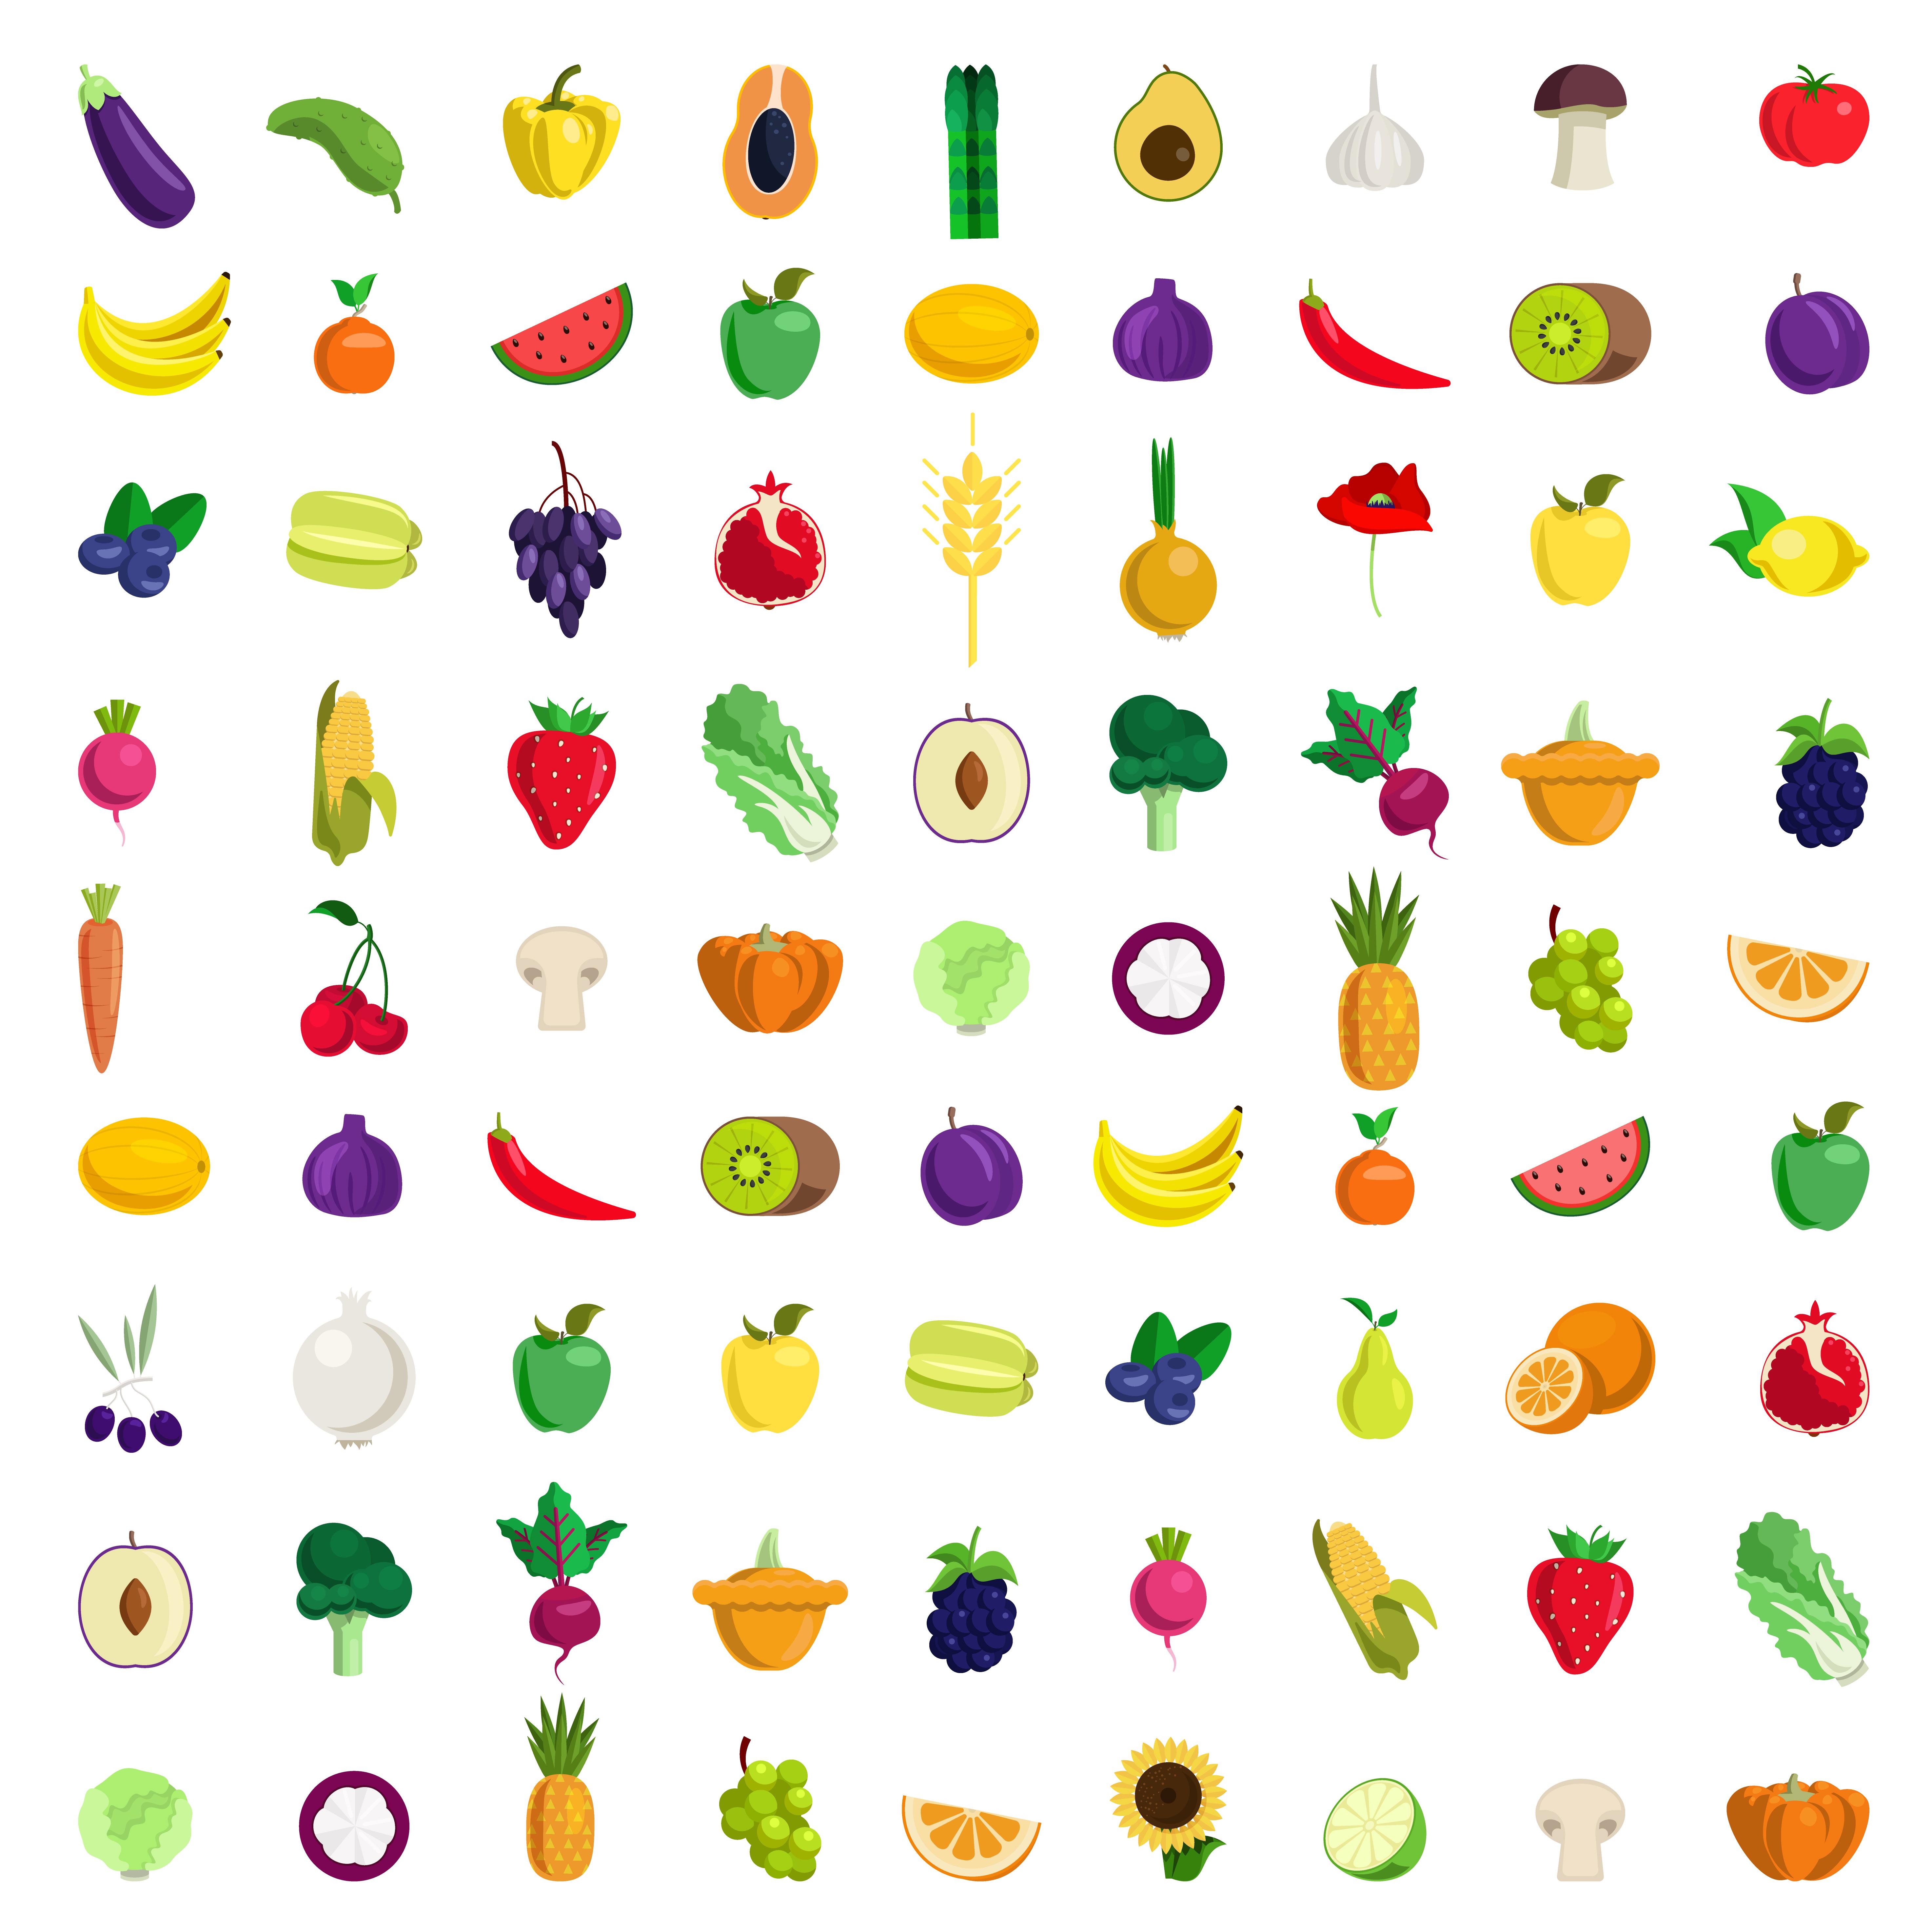 81 extra large stylish quality detail icon set farm fruit vegetable berry mushroom plants. Lemon banana strawberry pineapple kiwi cucumber tomato onion pepper plum orange wheat apple. Food collection.